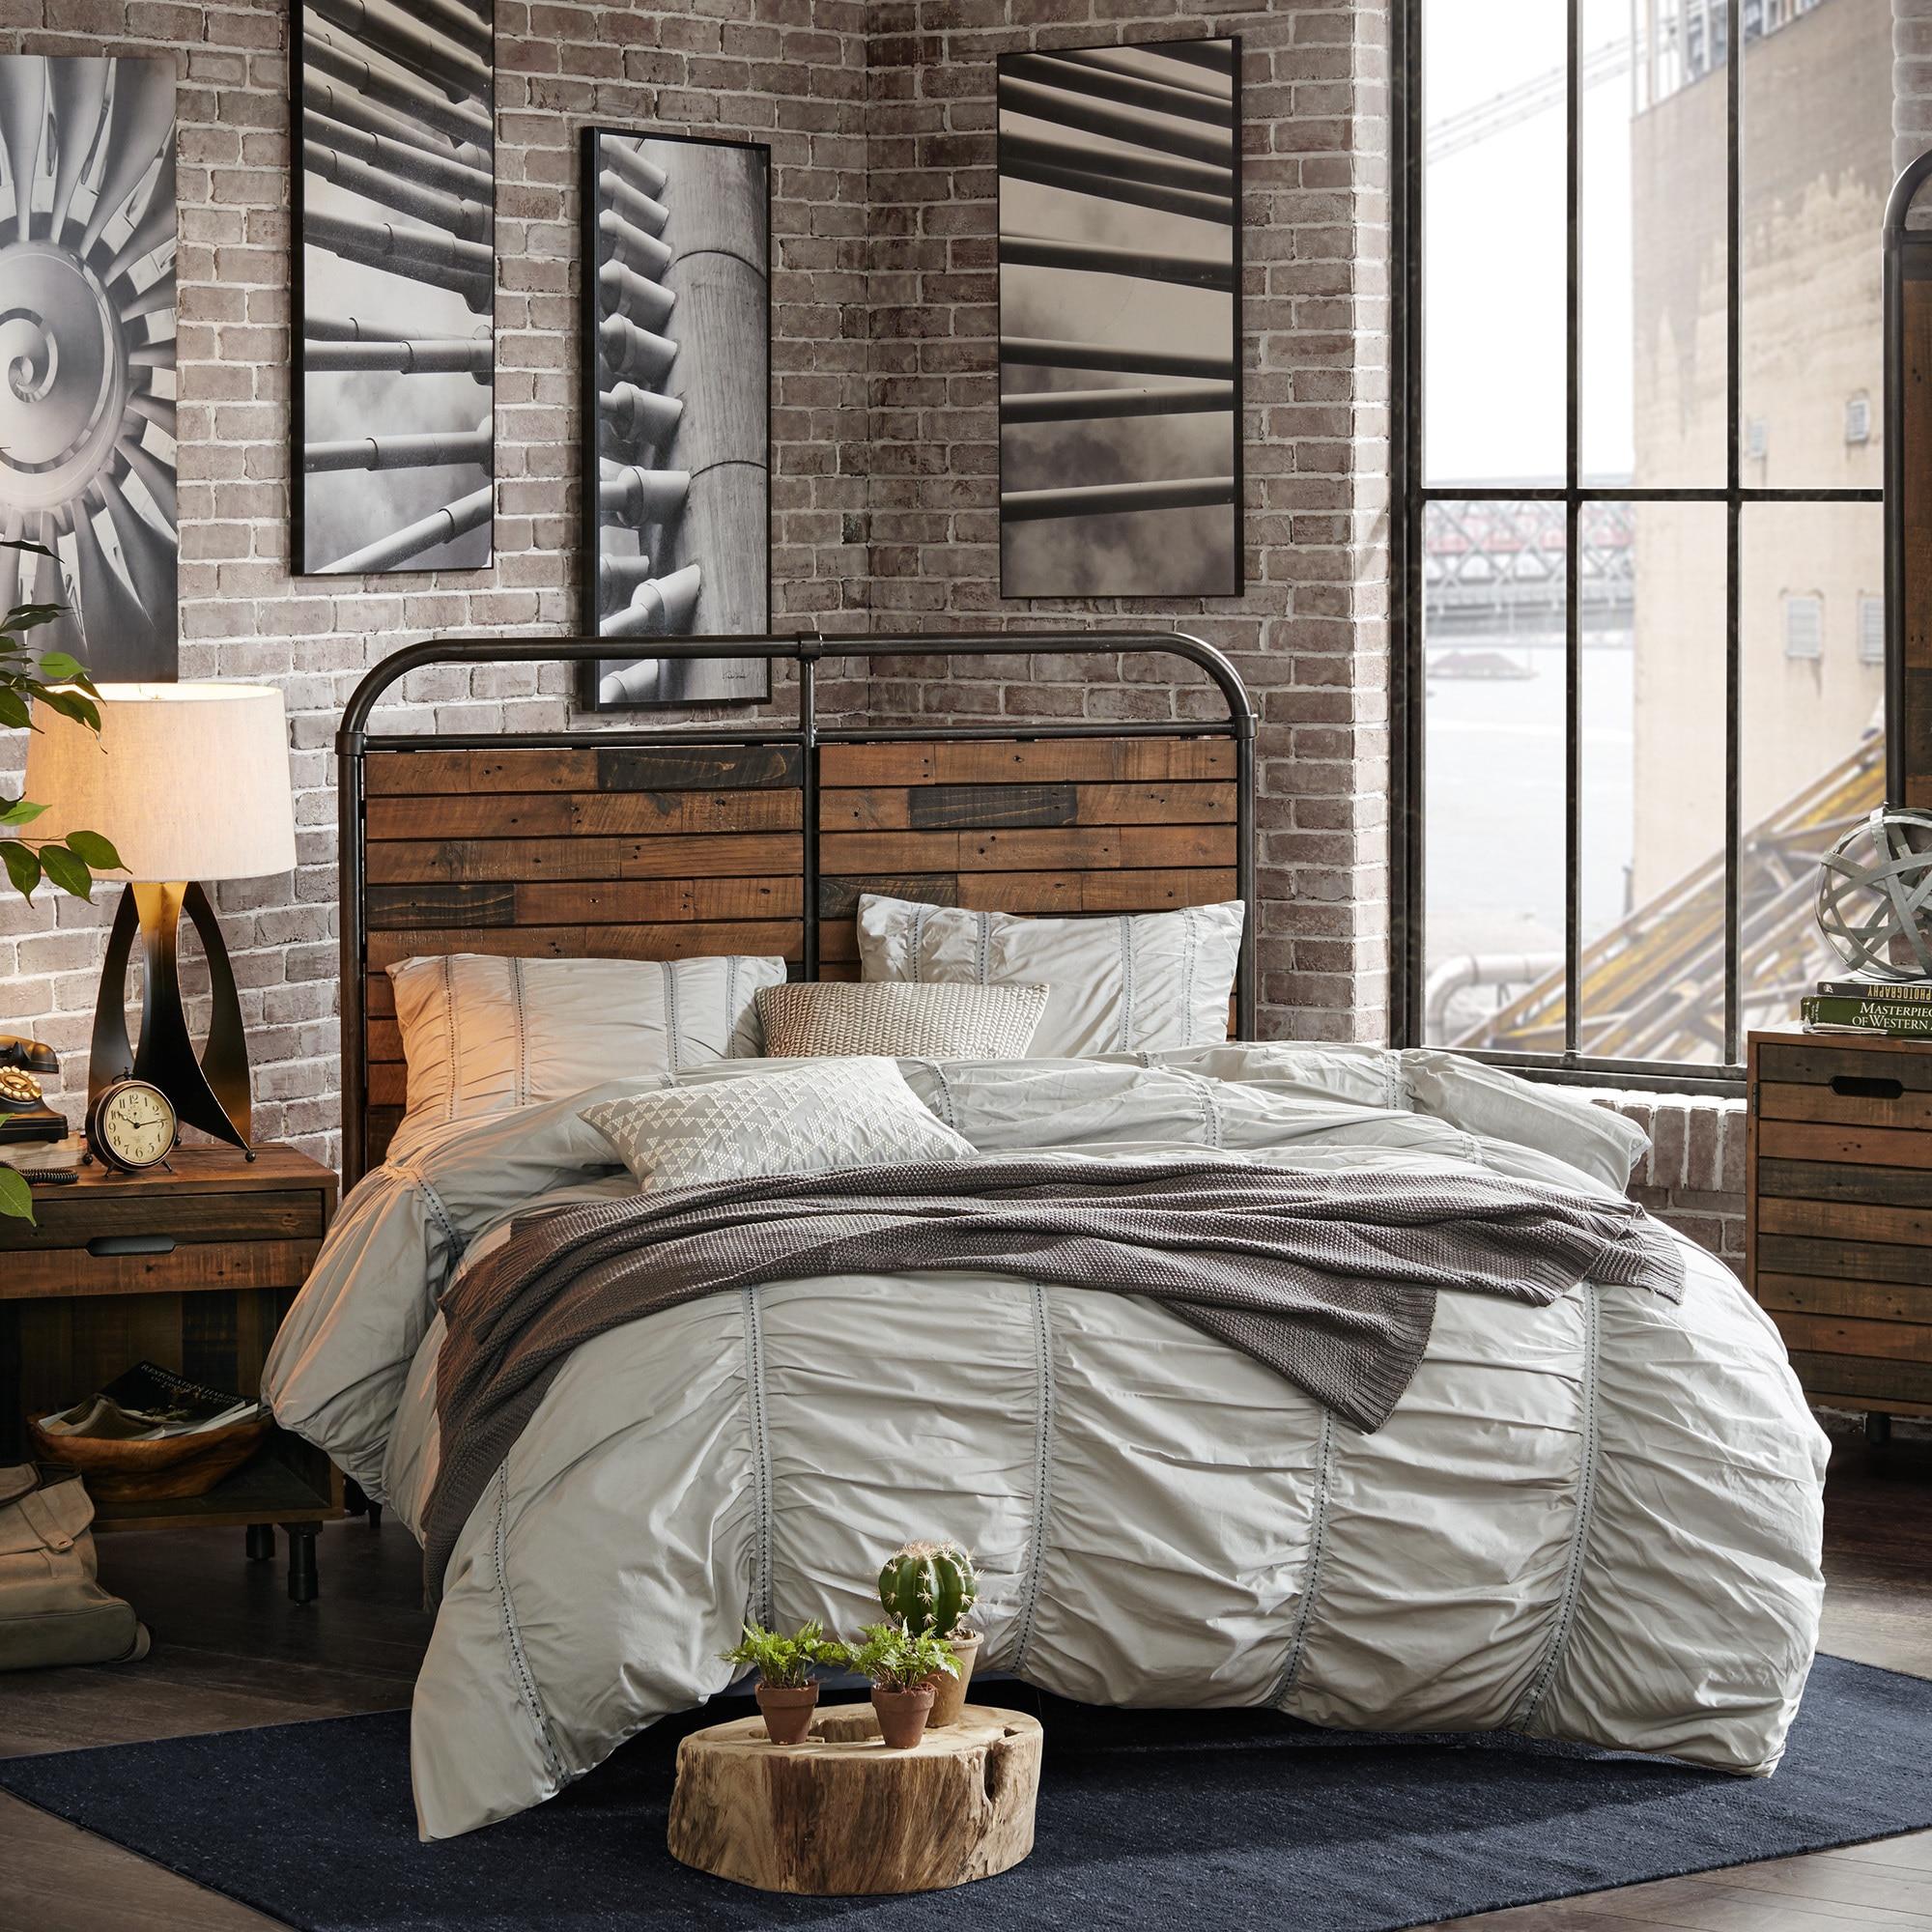 western handcrafted headboards bed dp dining amazon headboard com kitchen